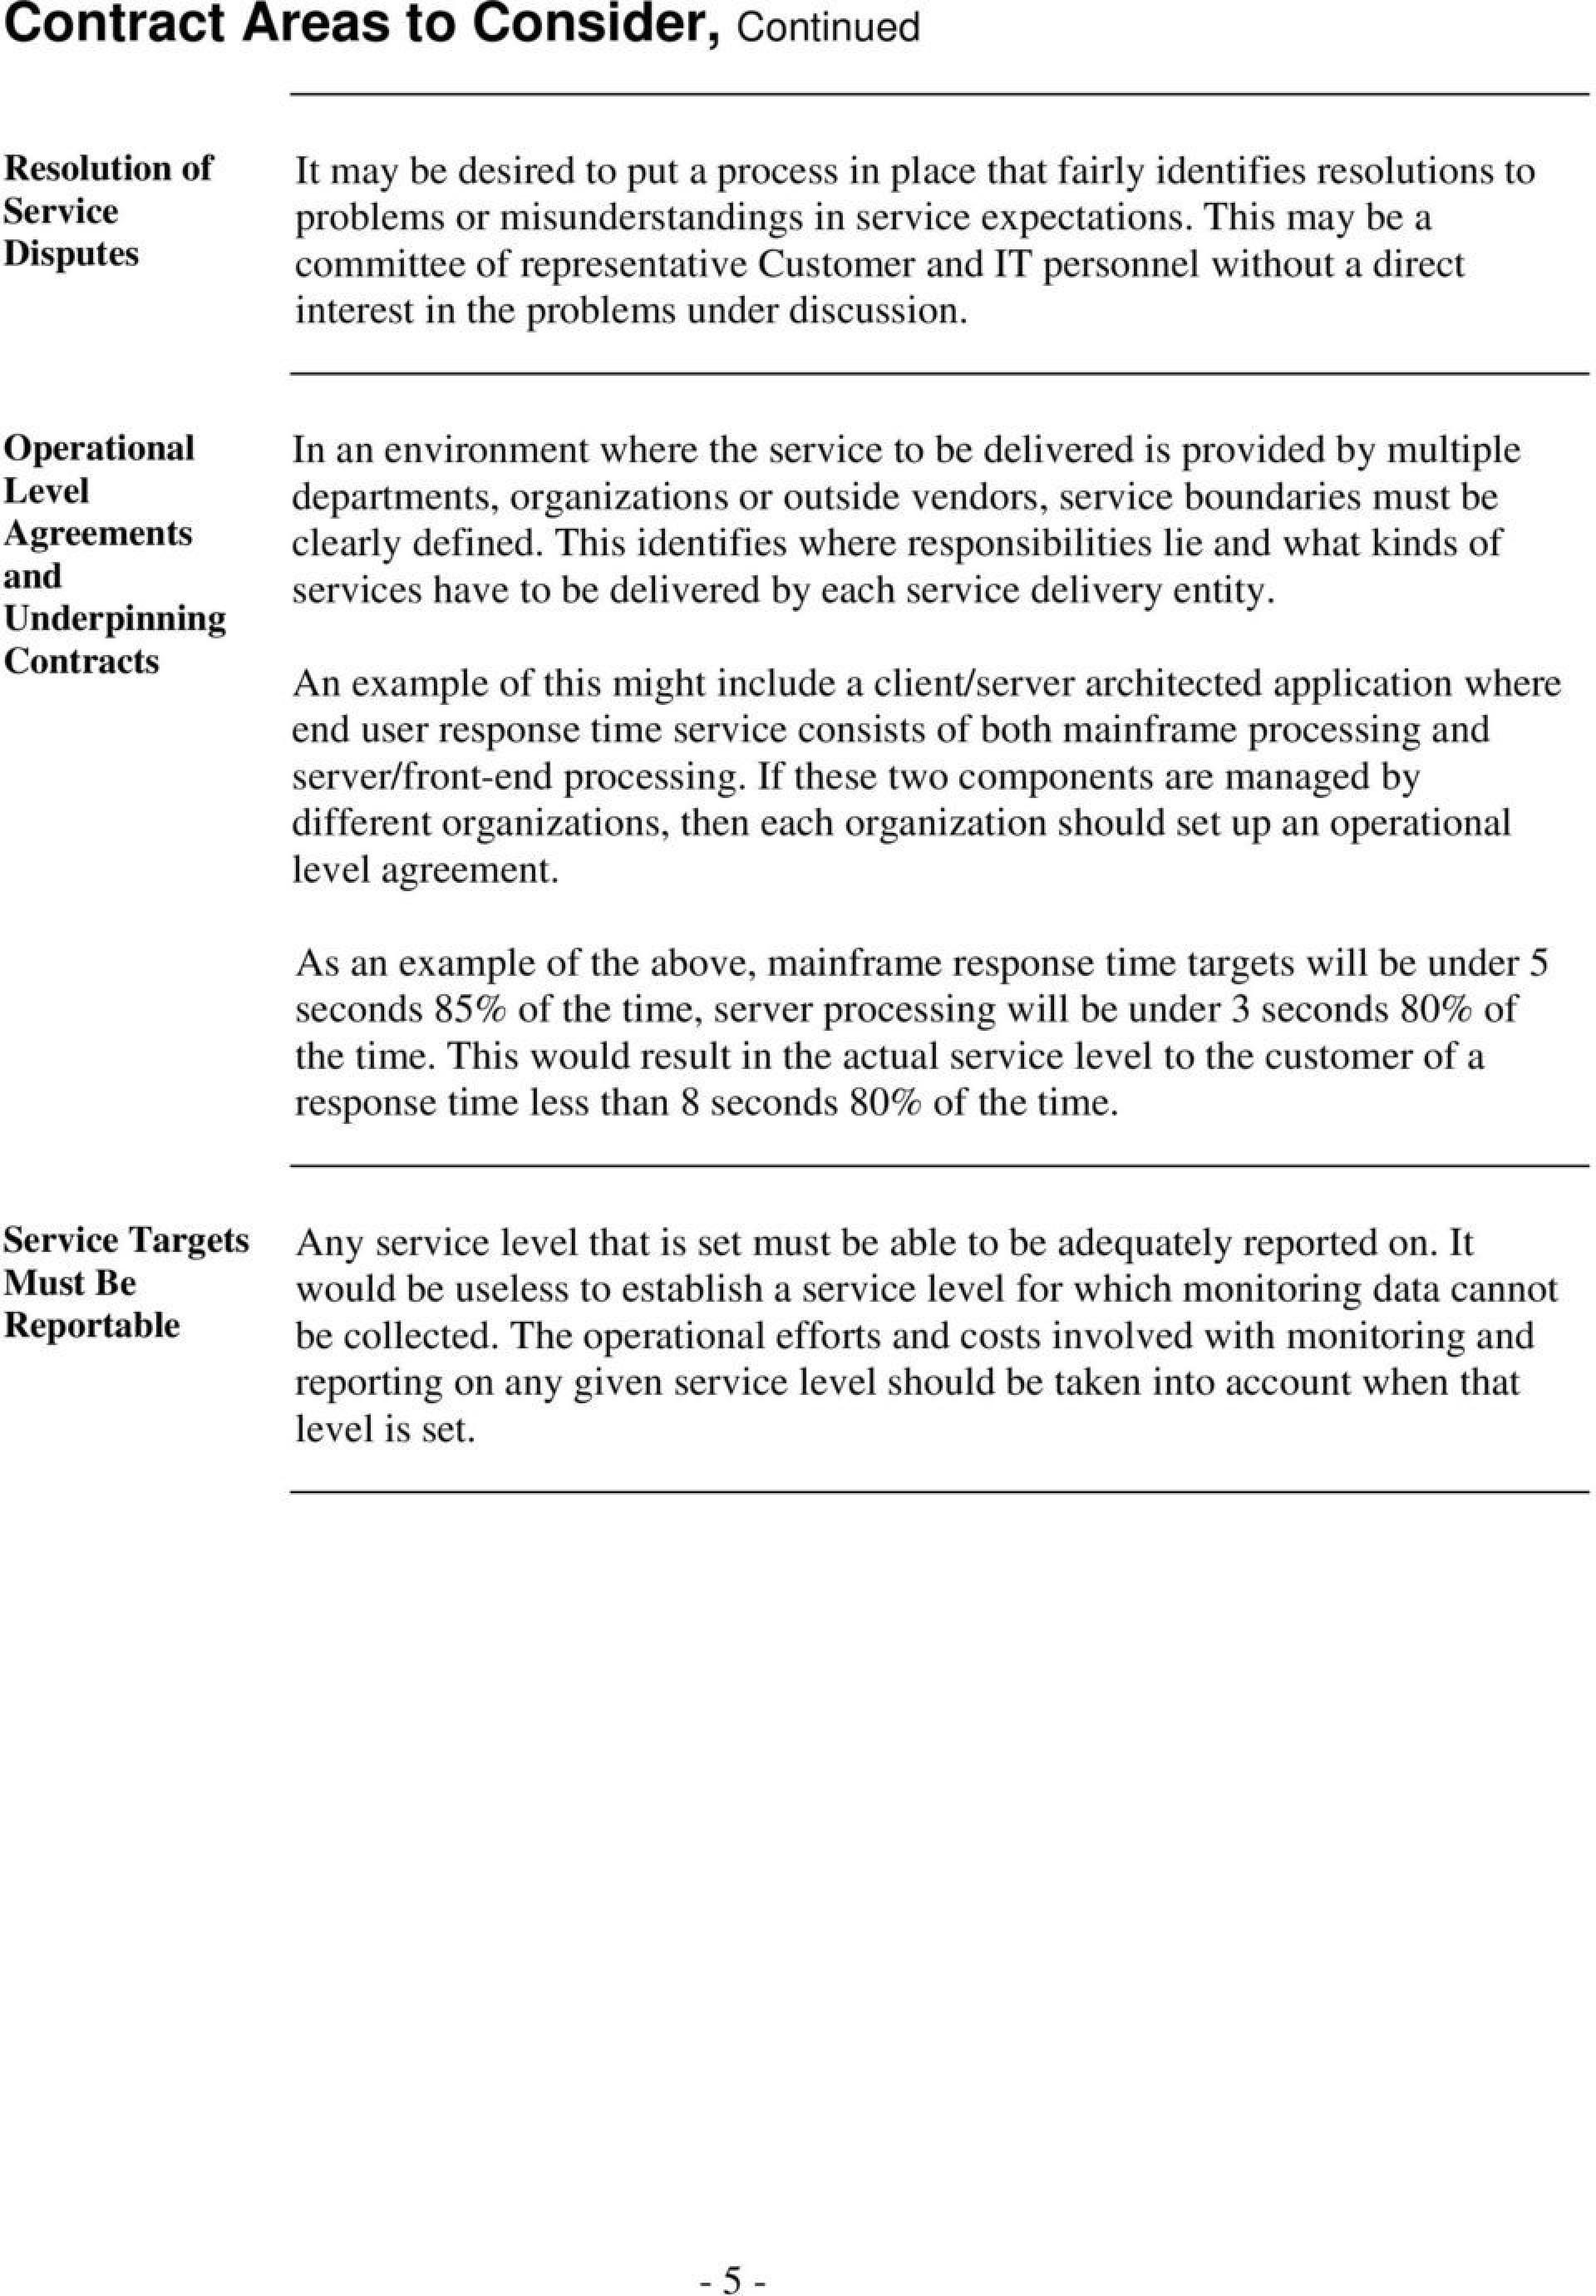 002 Sensational Service Level Agreement Template Photo  South Africa Nz For Website Development1920